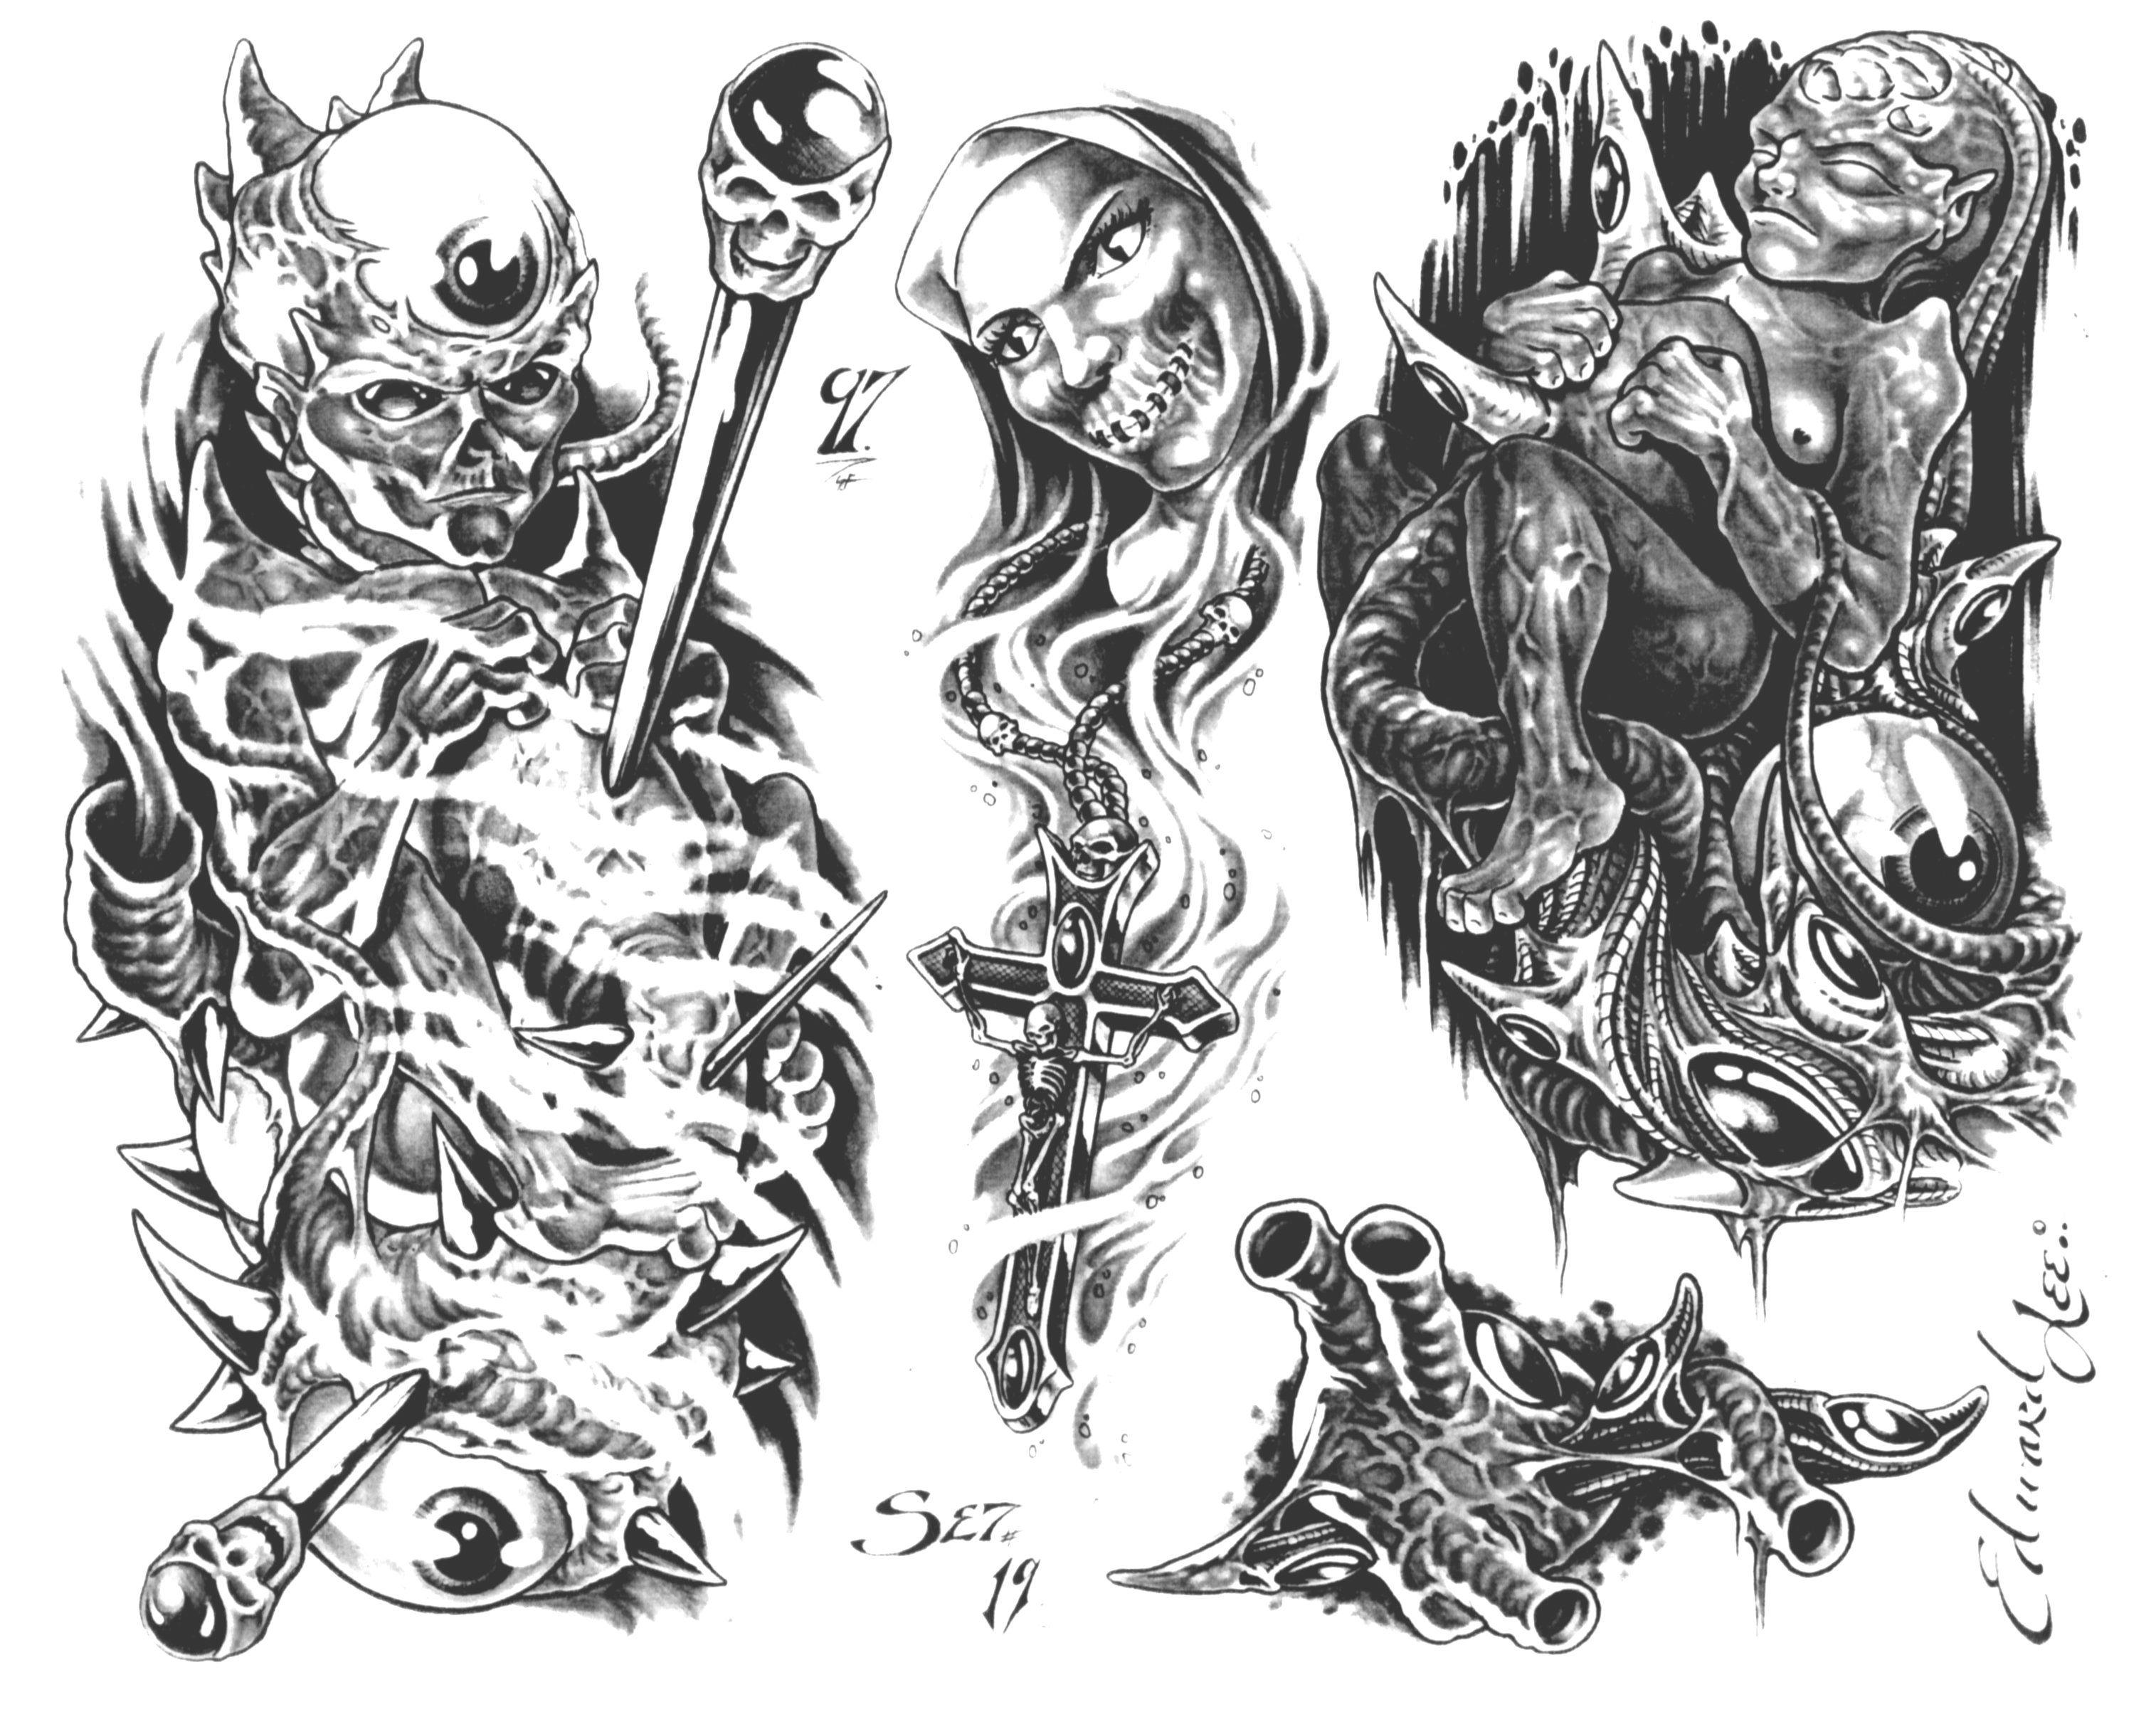 tattoo gangsta sketch google 39 da ara tattoizm pinterest chicano tattoos tattoo flash and. Black Bedroom Furniture Sets. Home Design Ideas